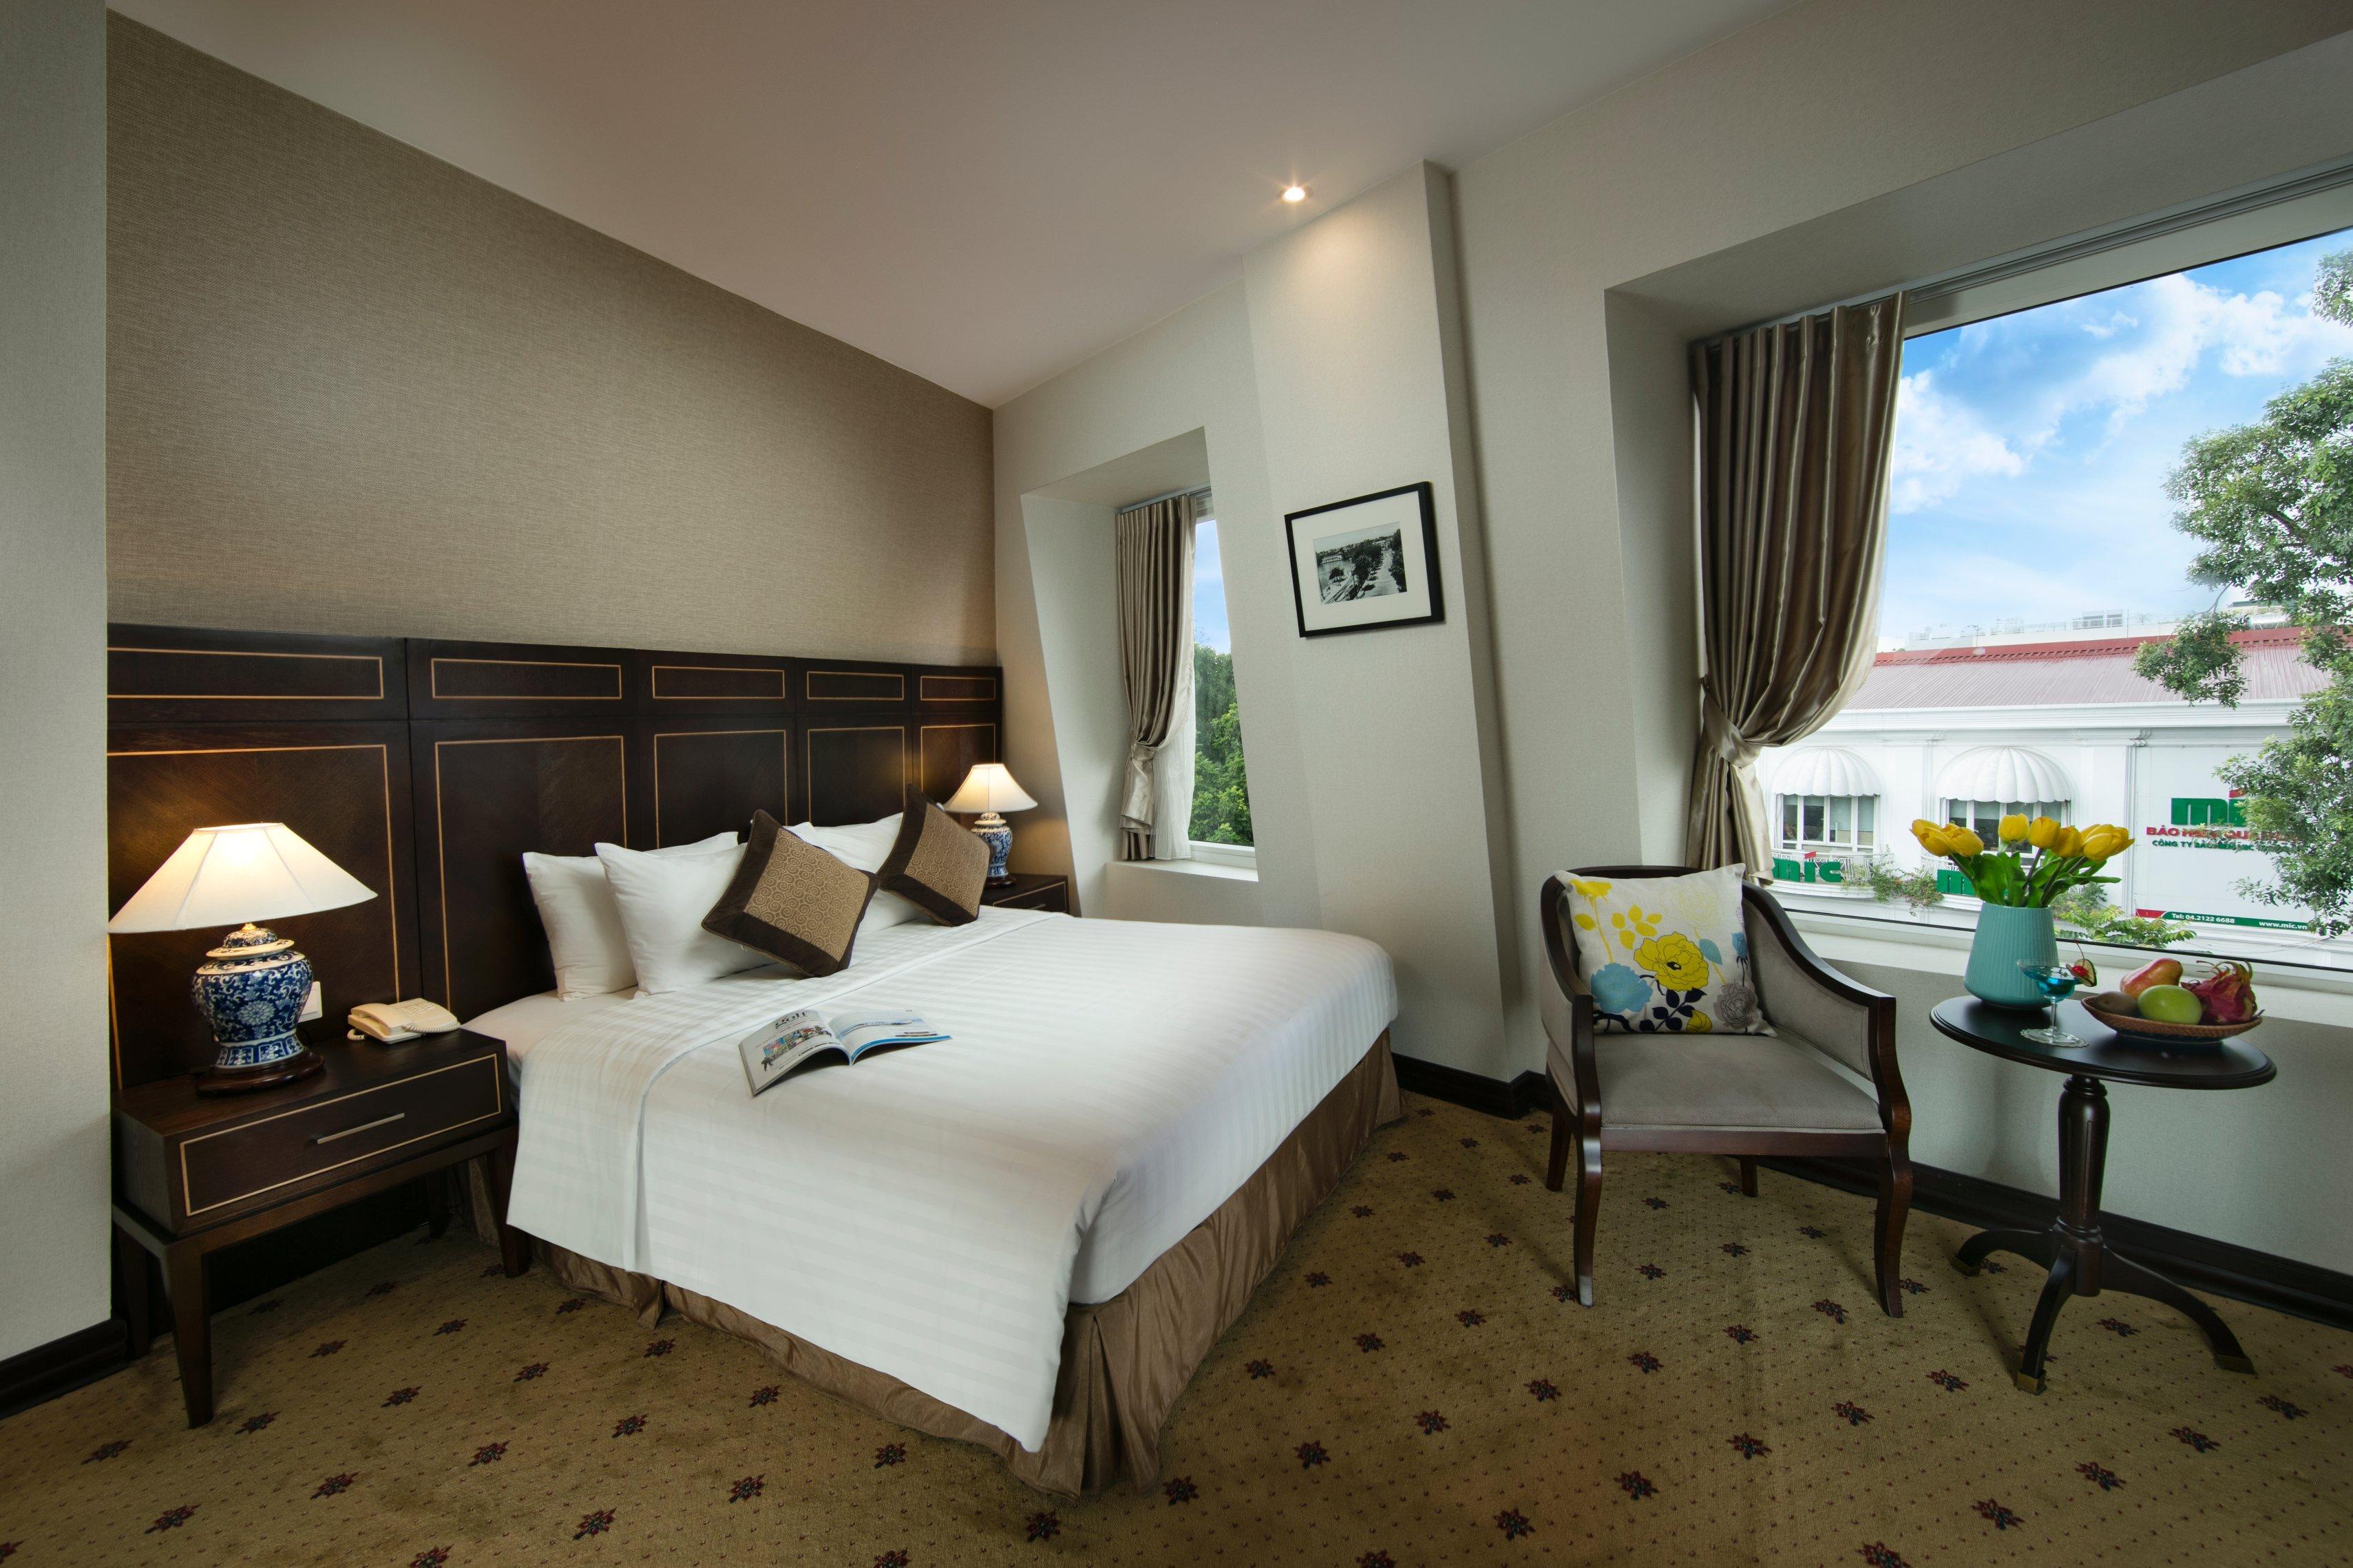 Hanoiu0027s Best Boutique Hotels | CNN Travel